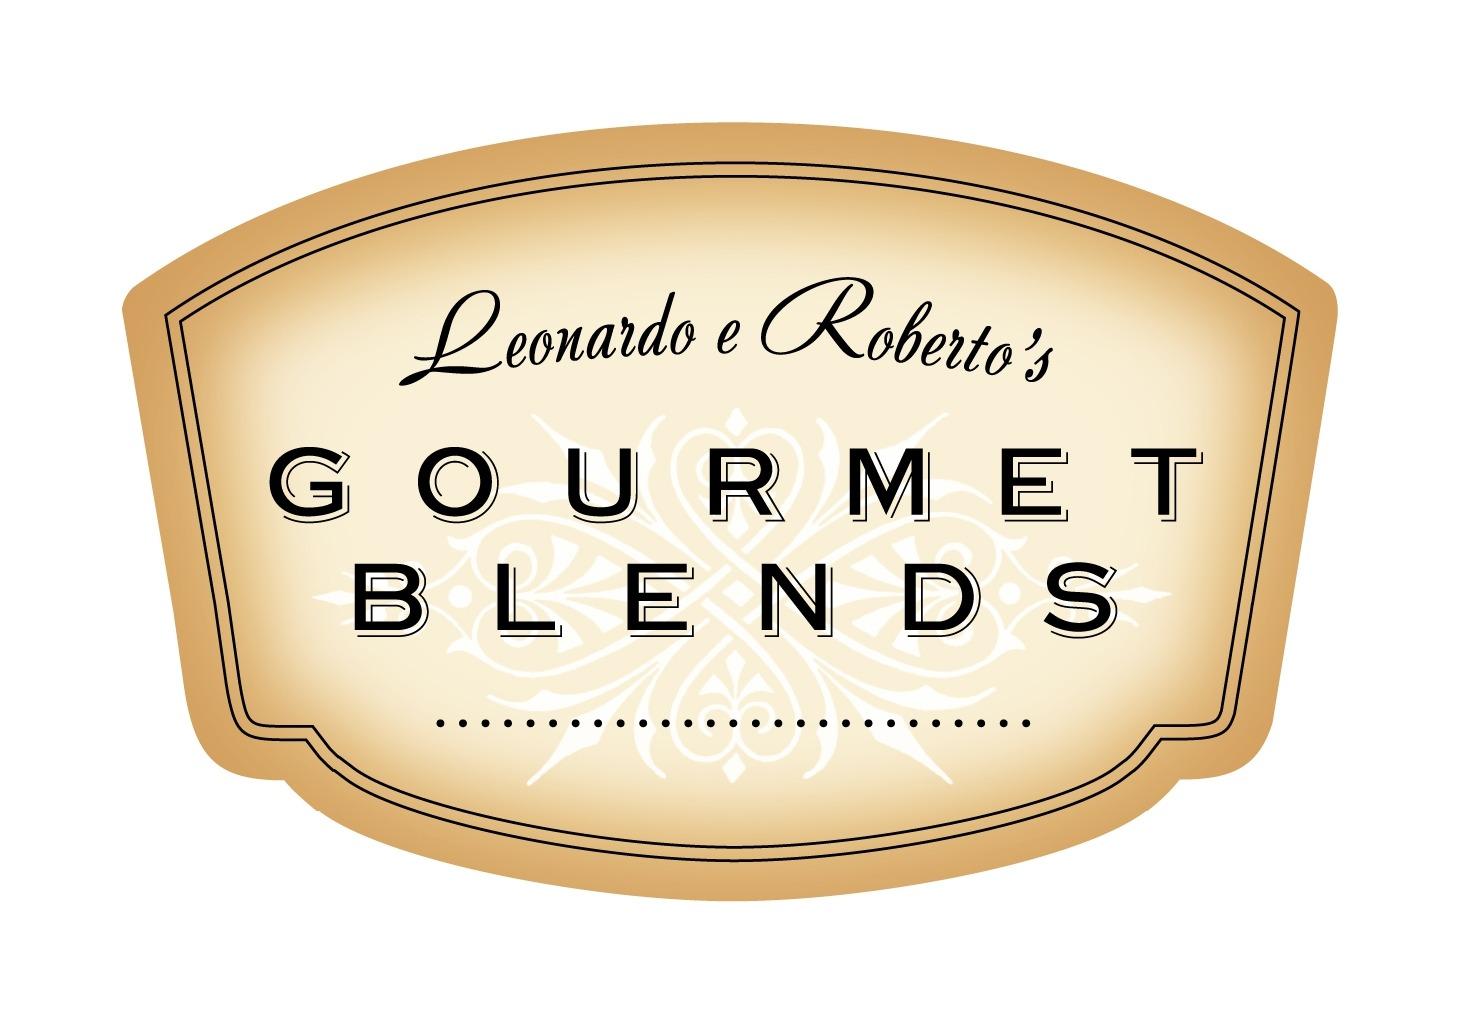 Gourmet Blends Promo Code